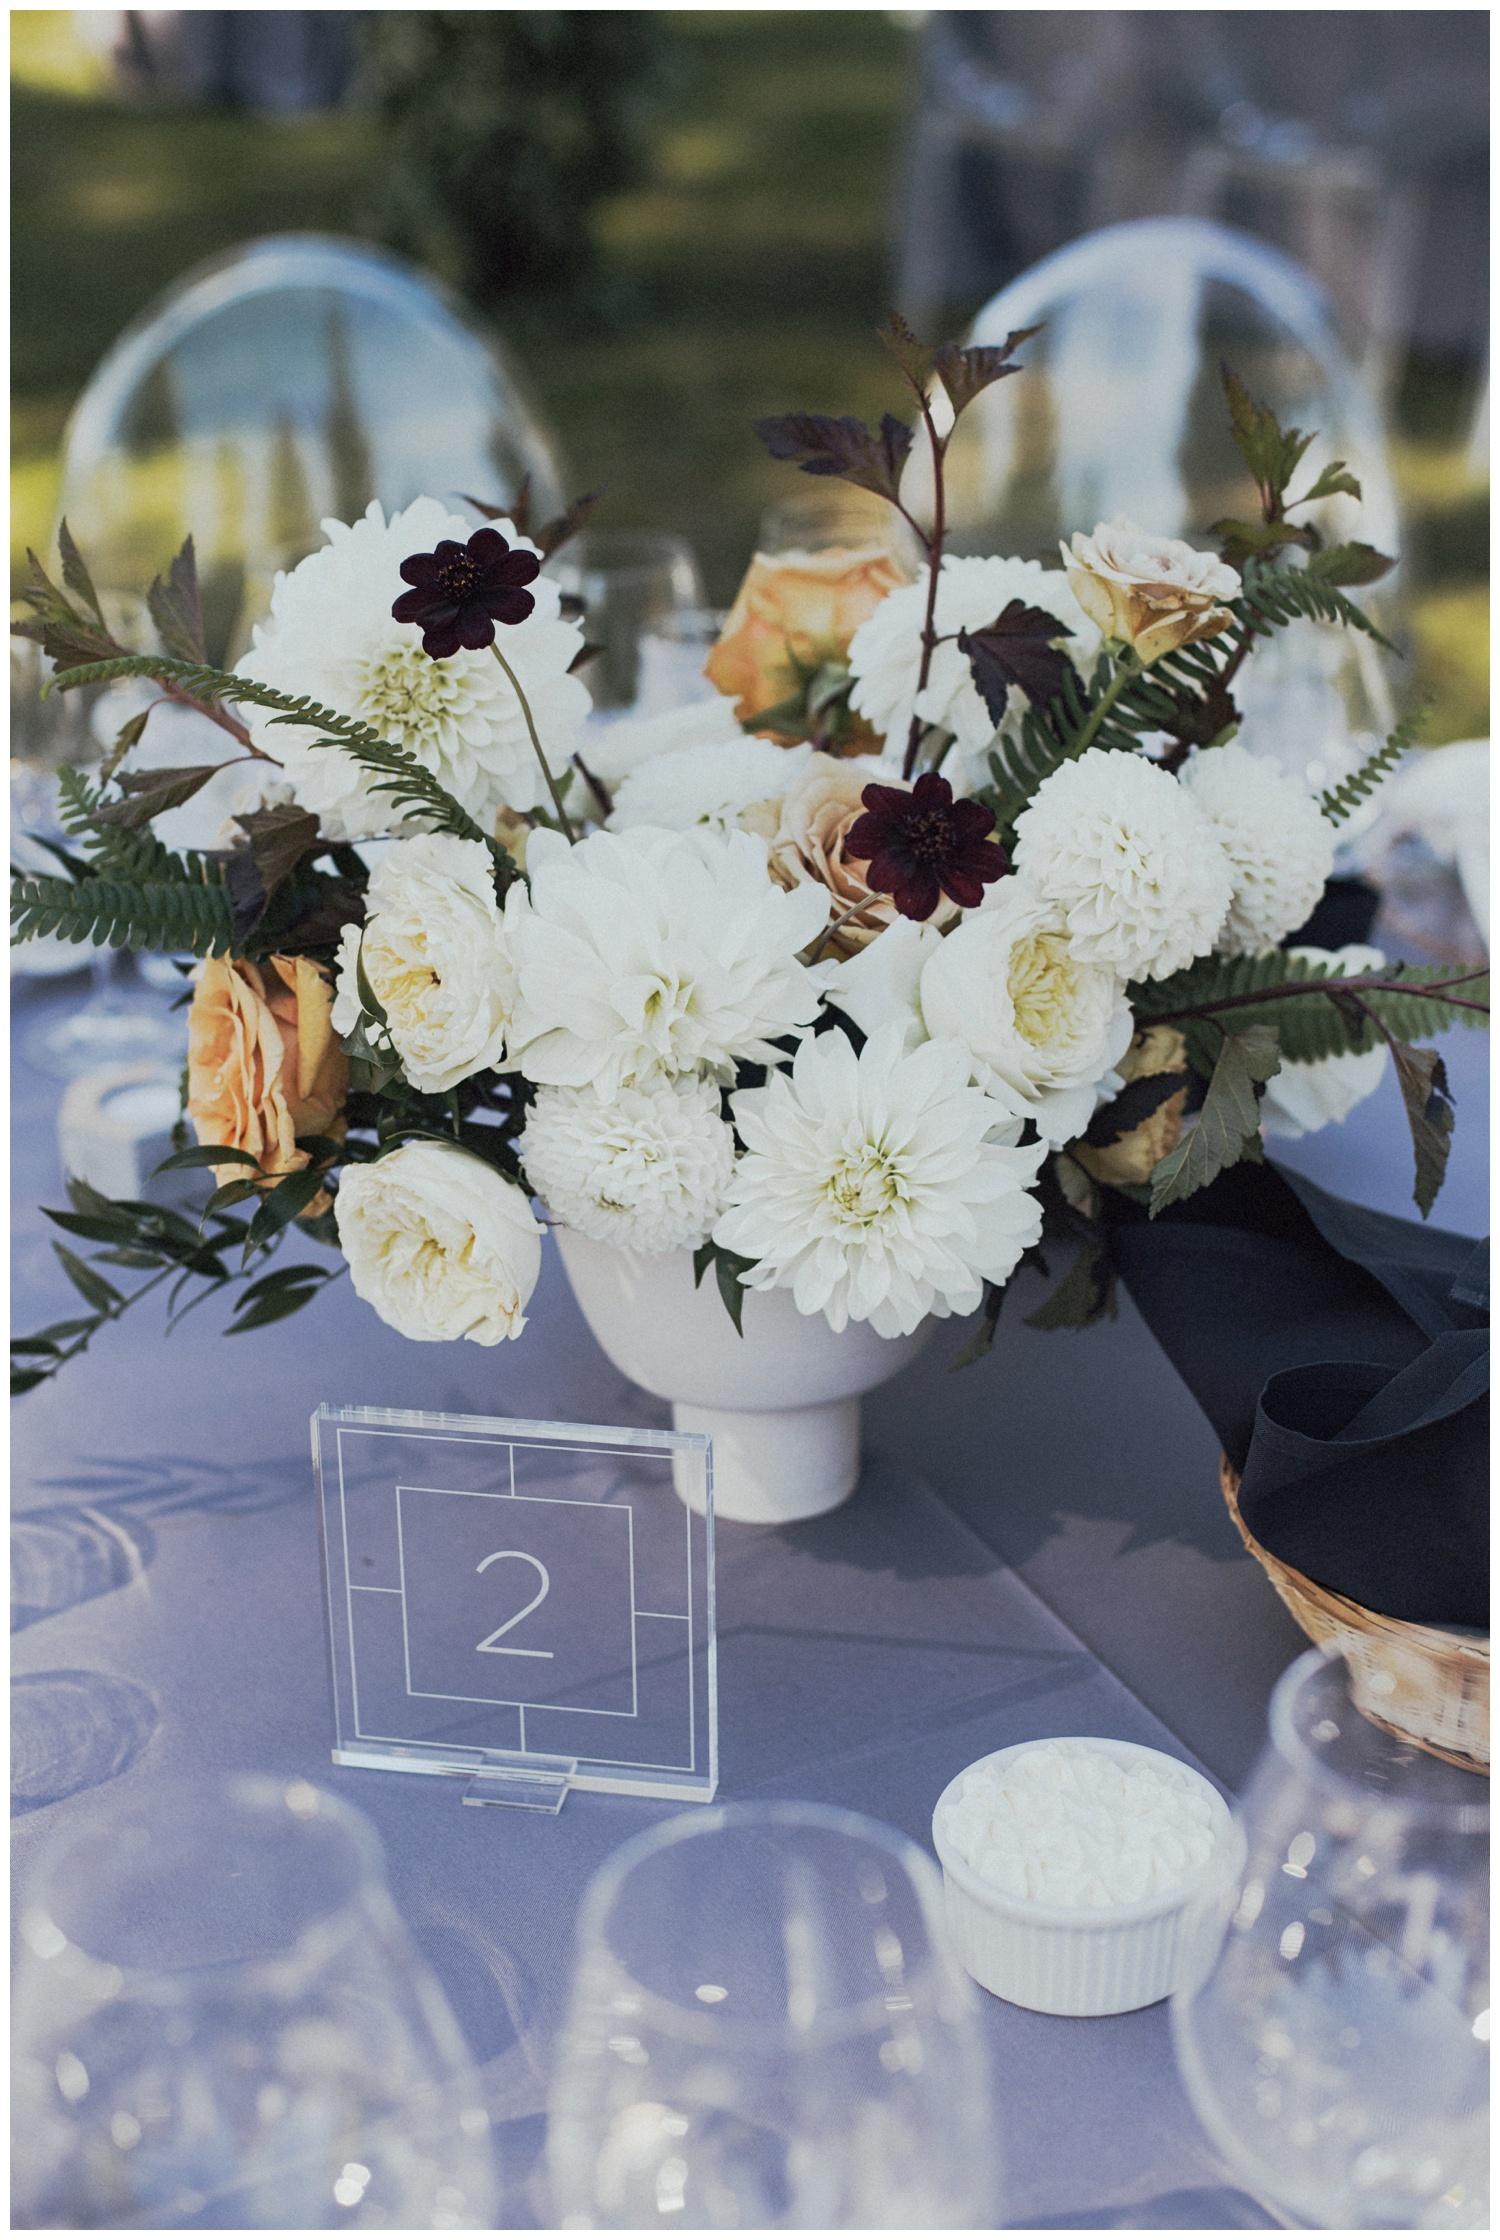 House_on_metolius_wedding_Portland_Wedding_Florist_Branch_and_Cole_Photography_8.jpg